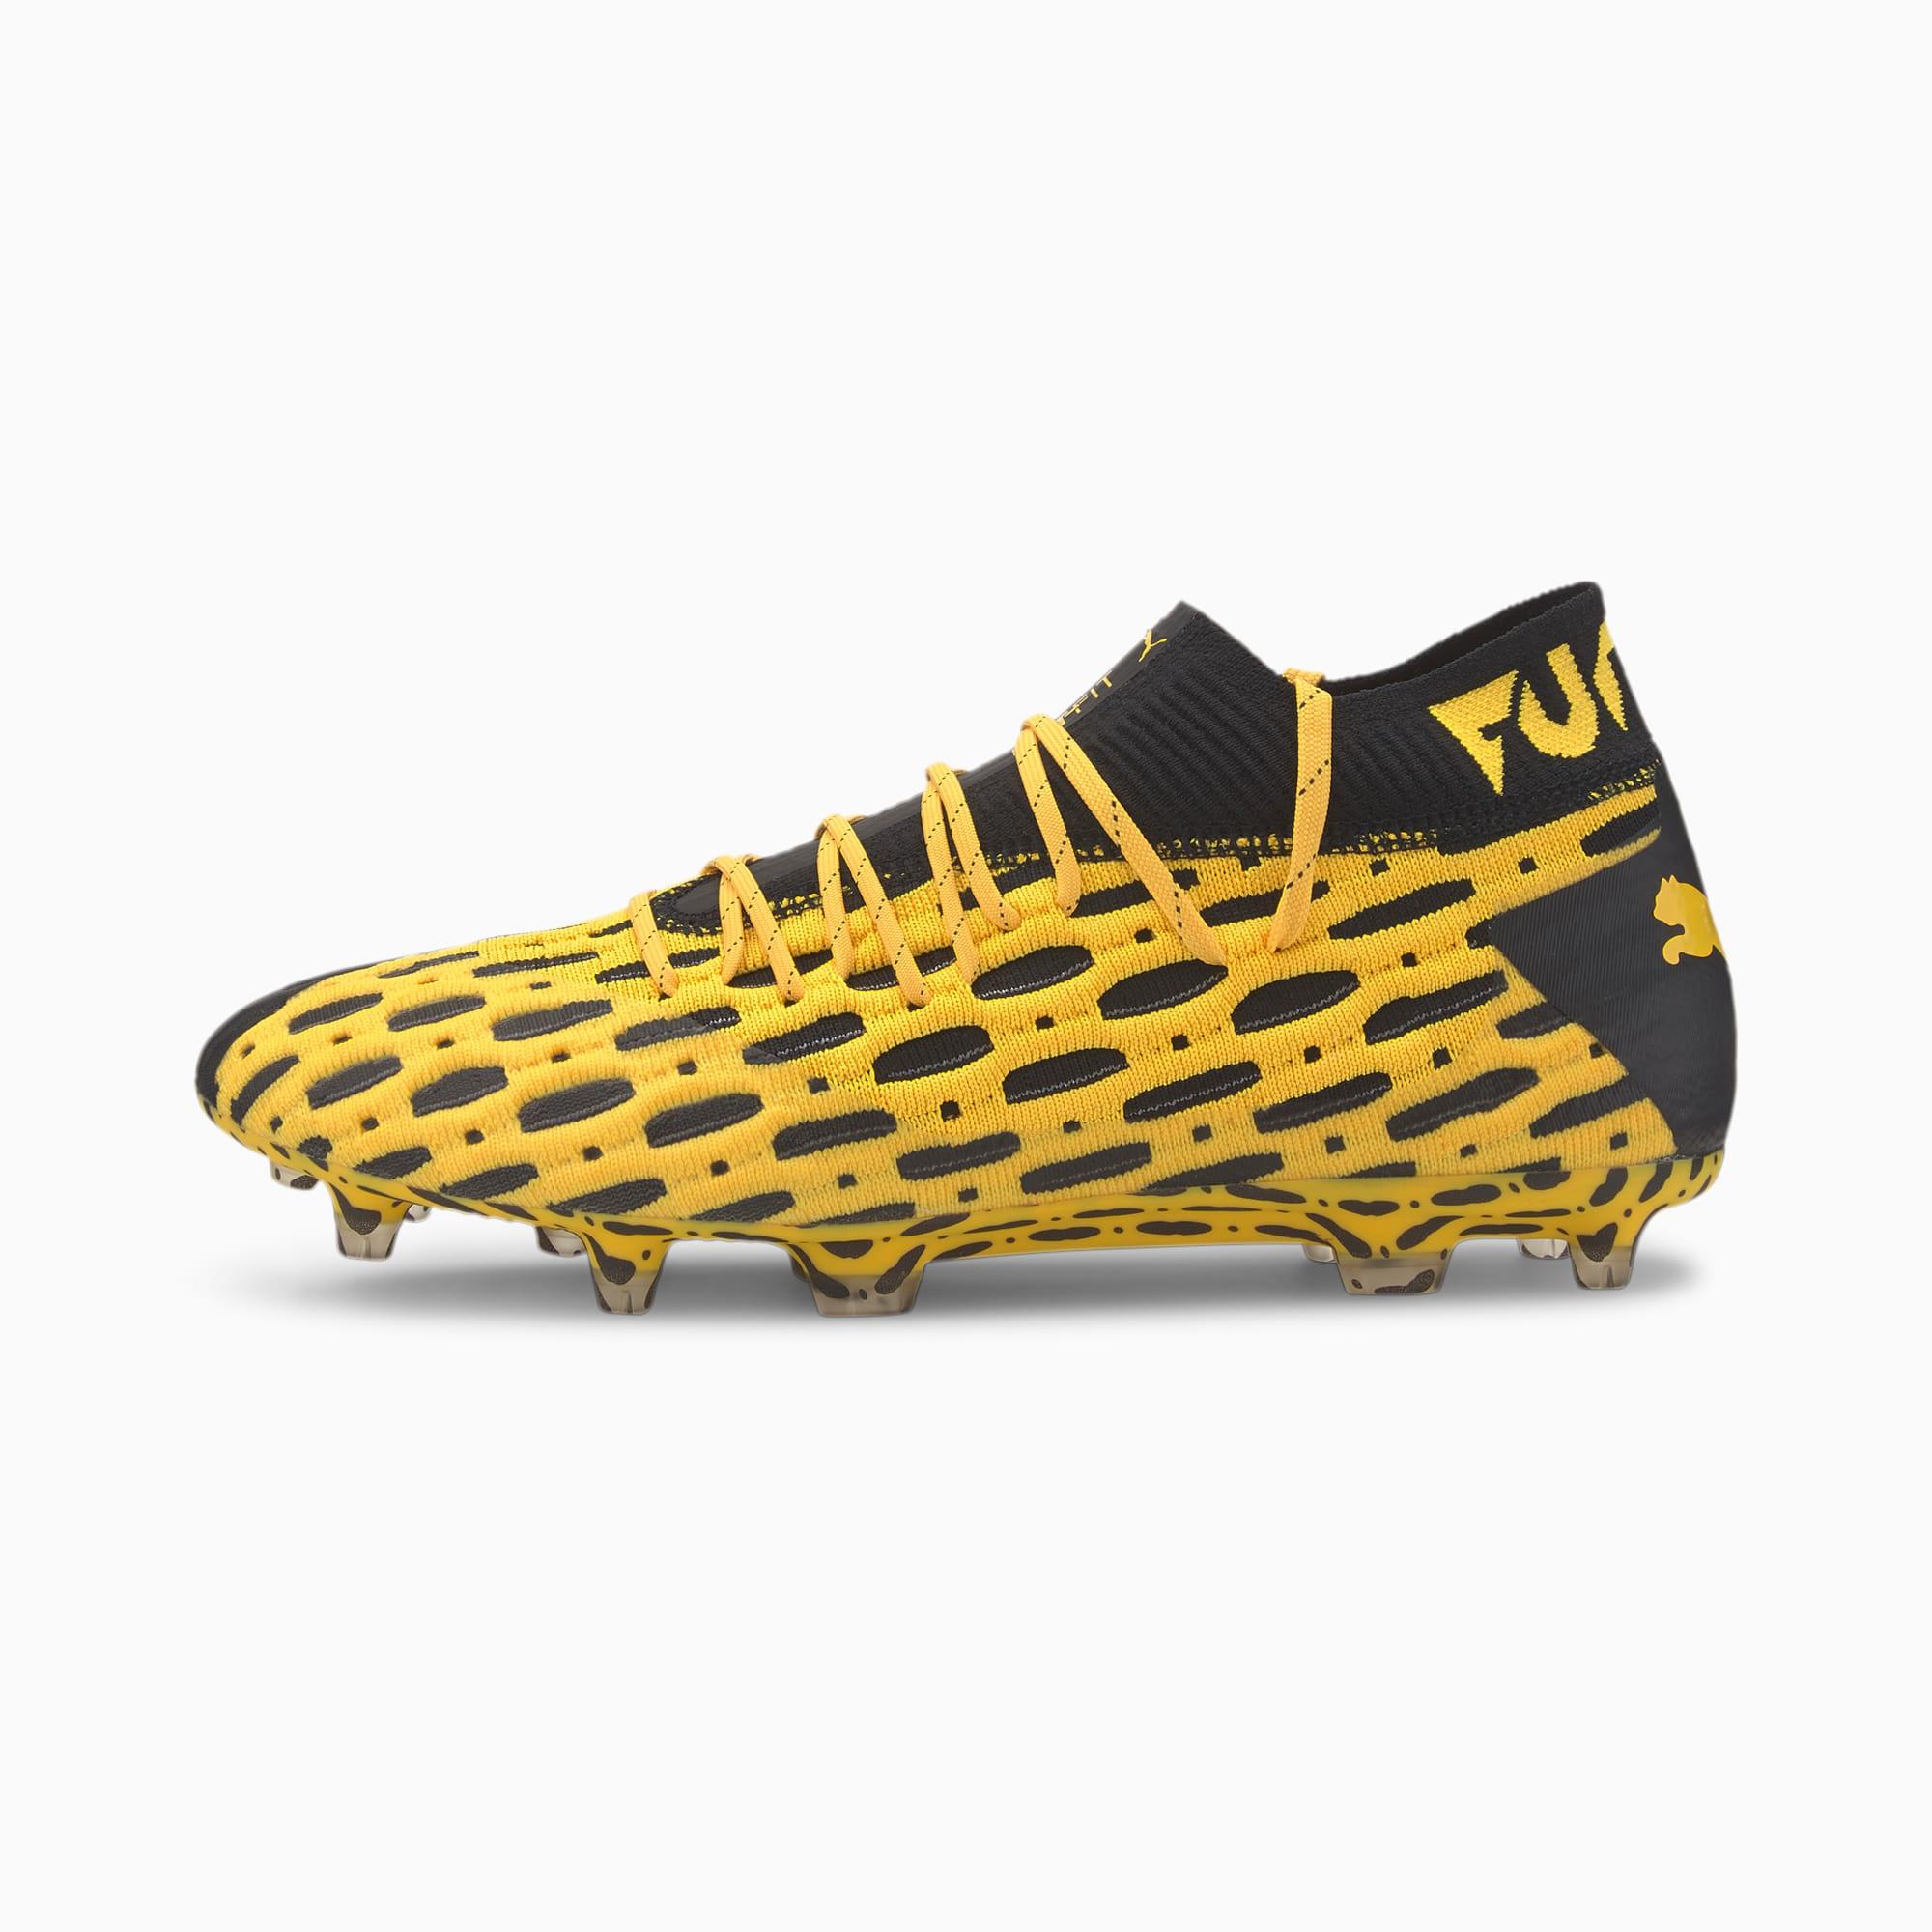 FUTURE 5.1 NETFIT FG/AG Men's Football Boots